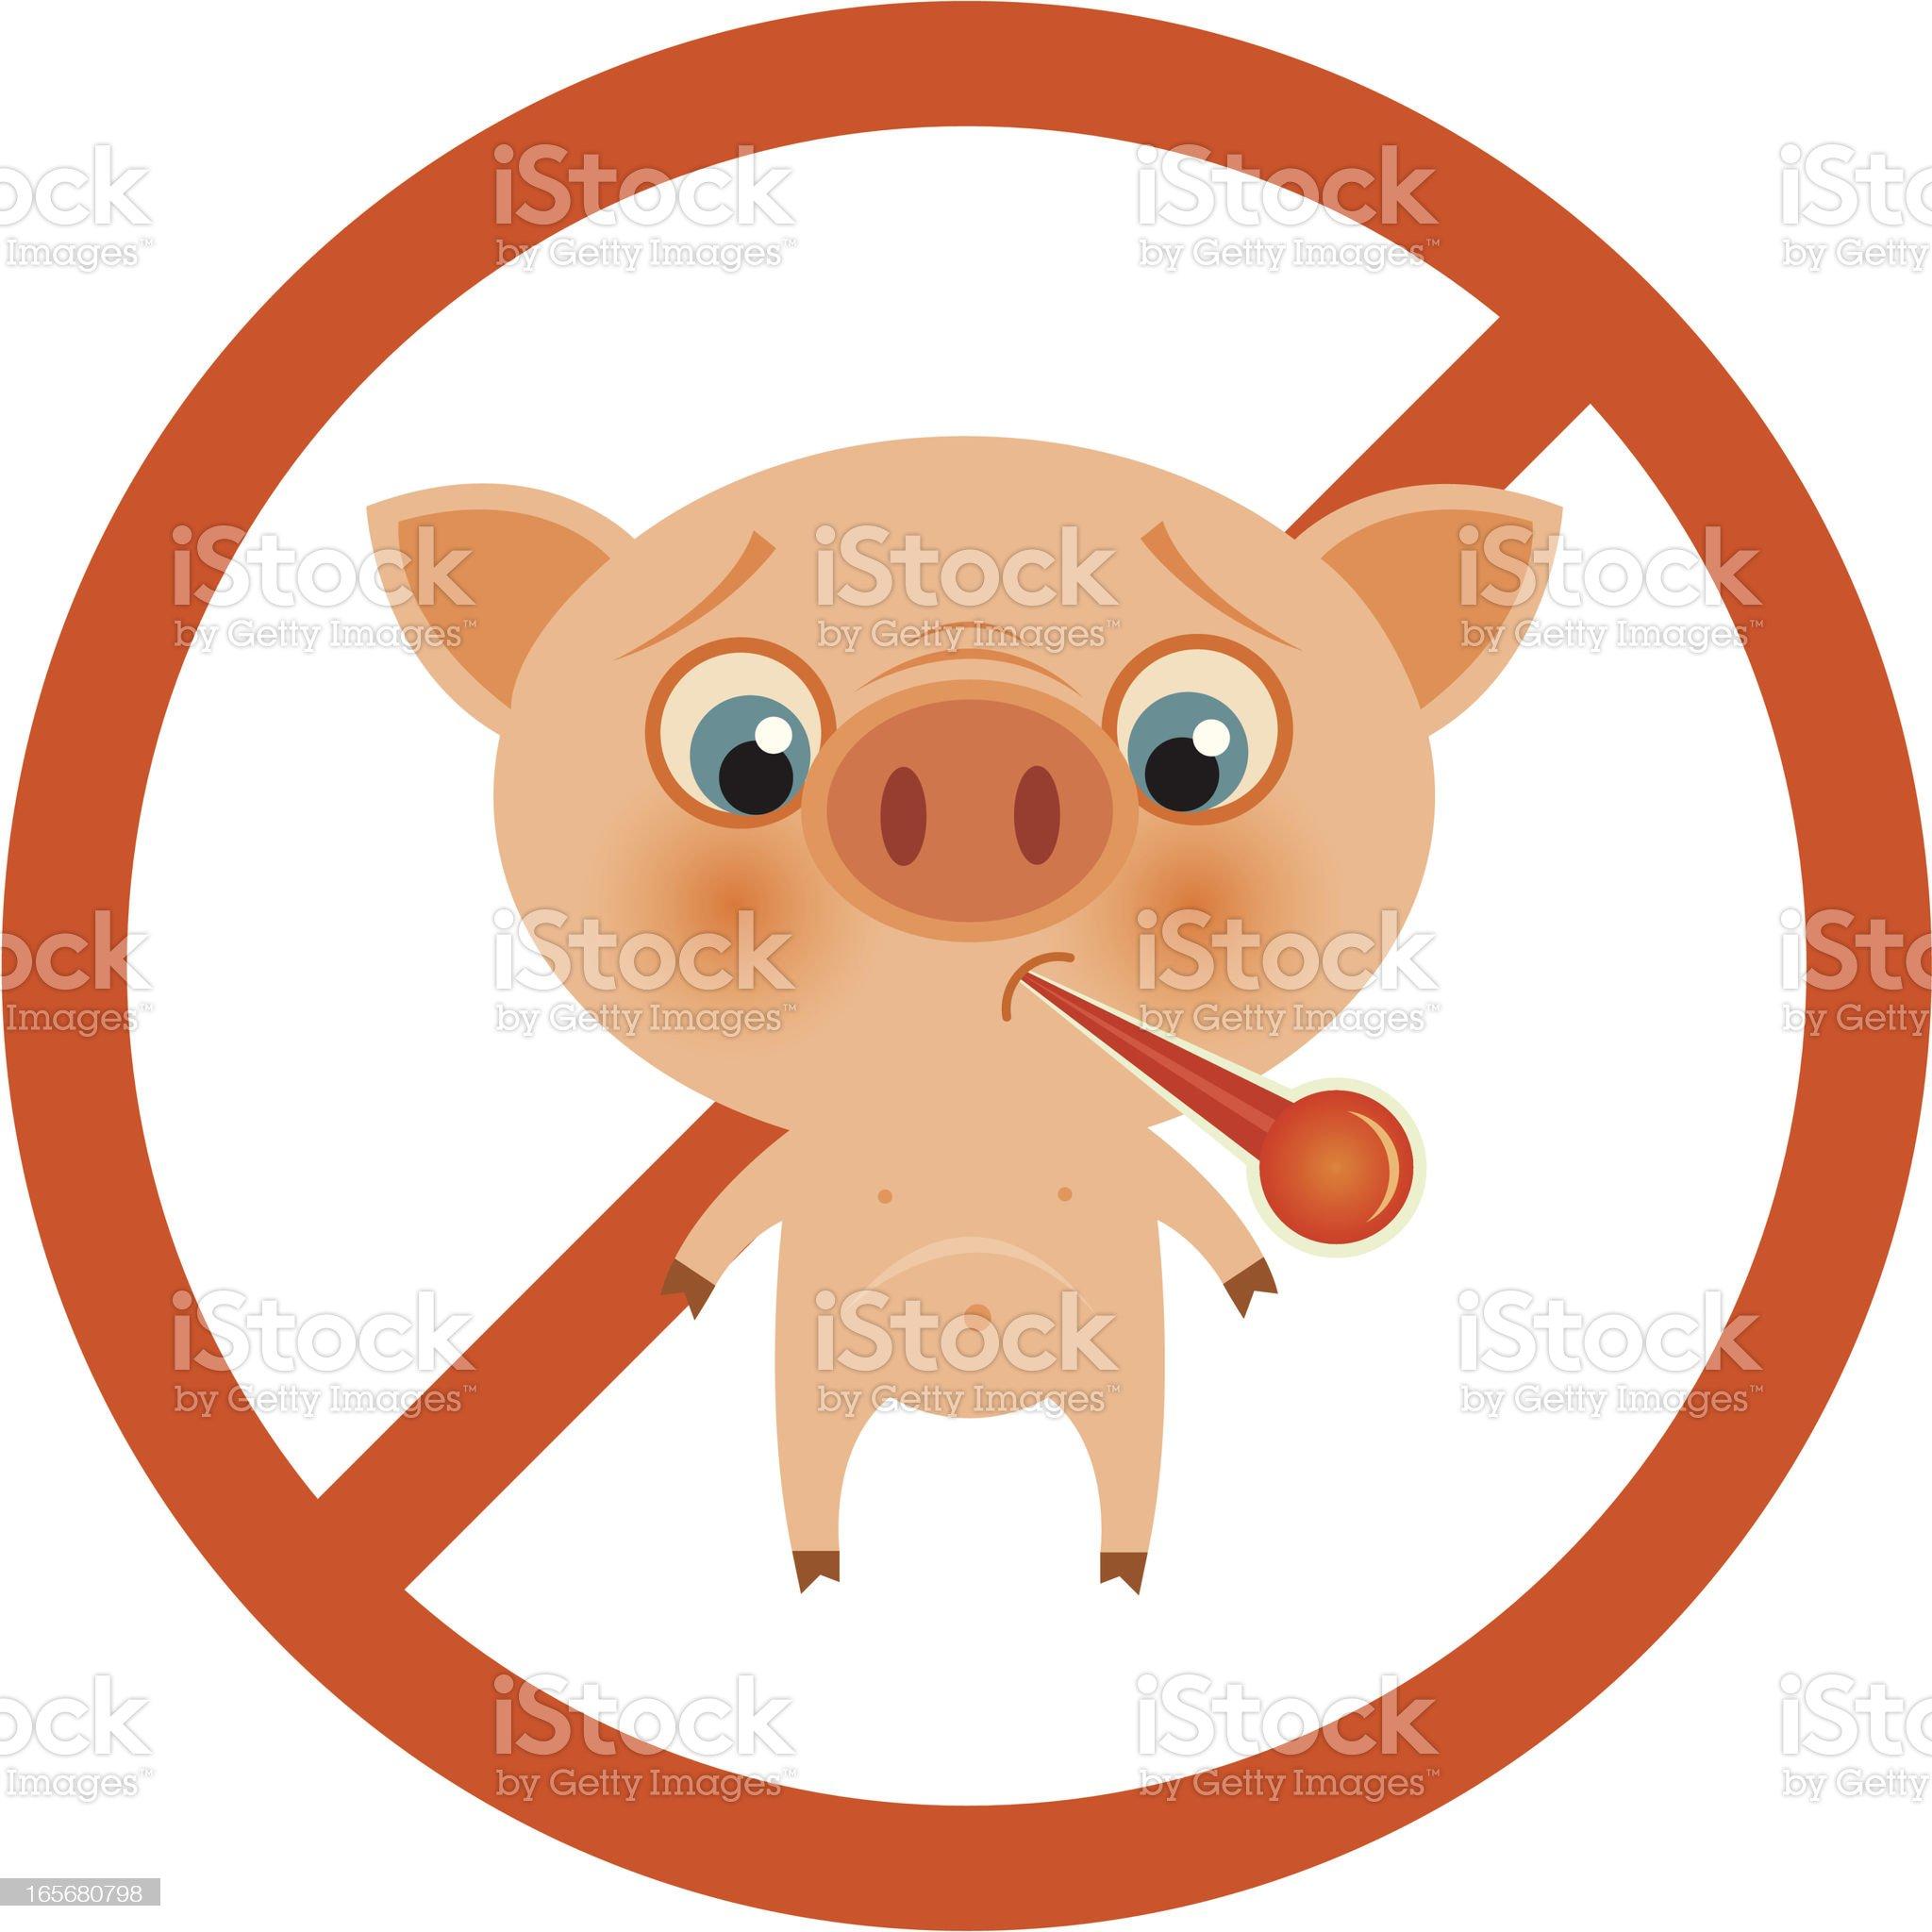 No Swine Flu! royalty-free stock vector art